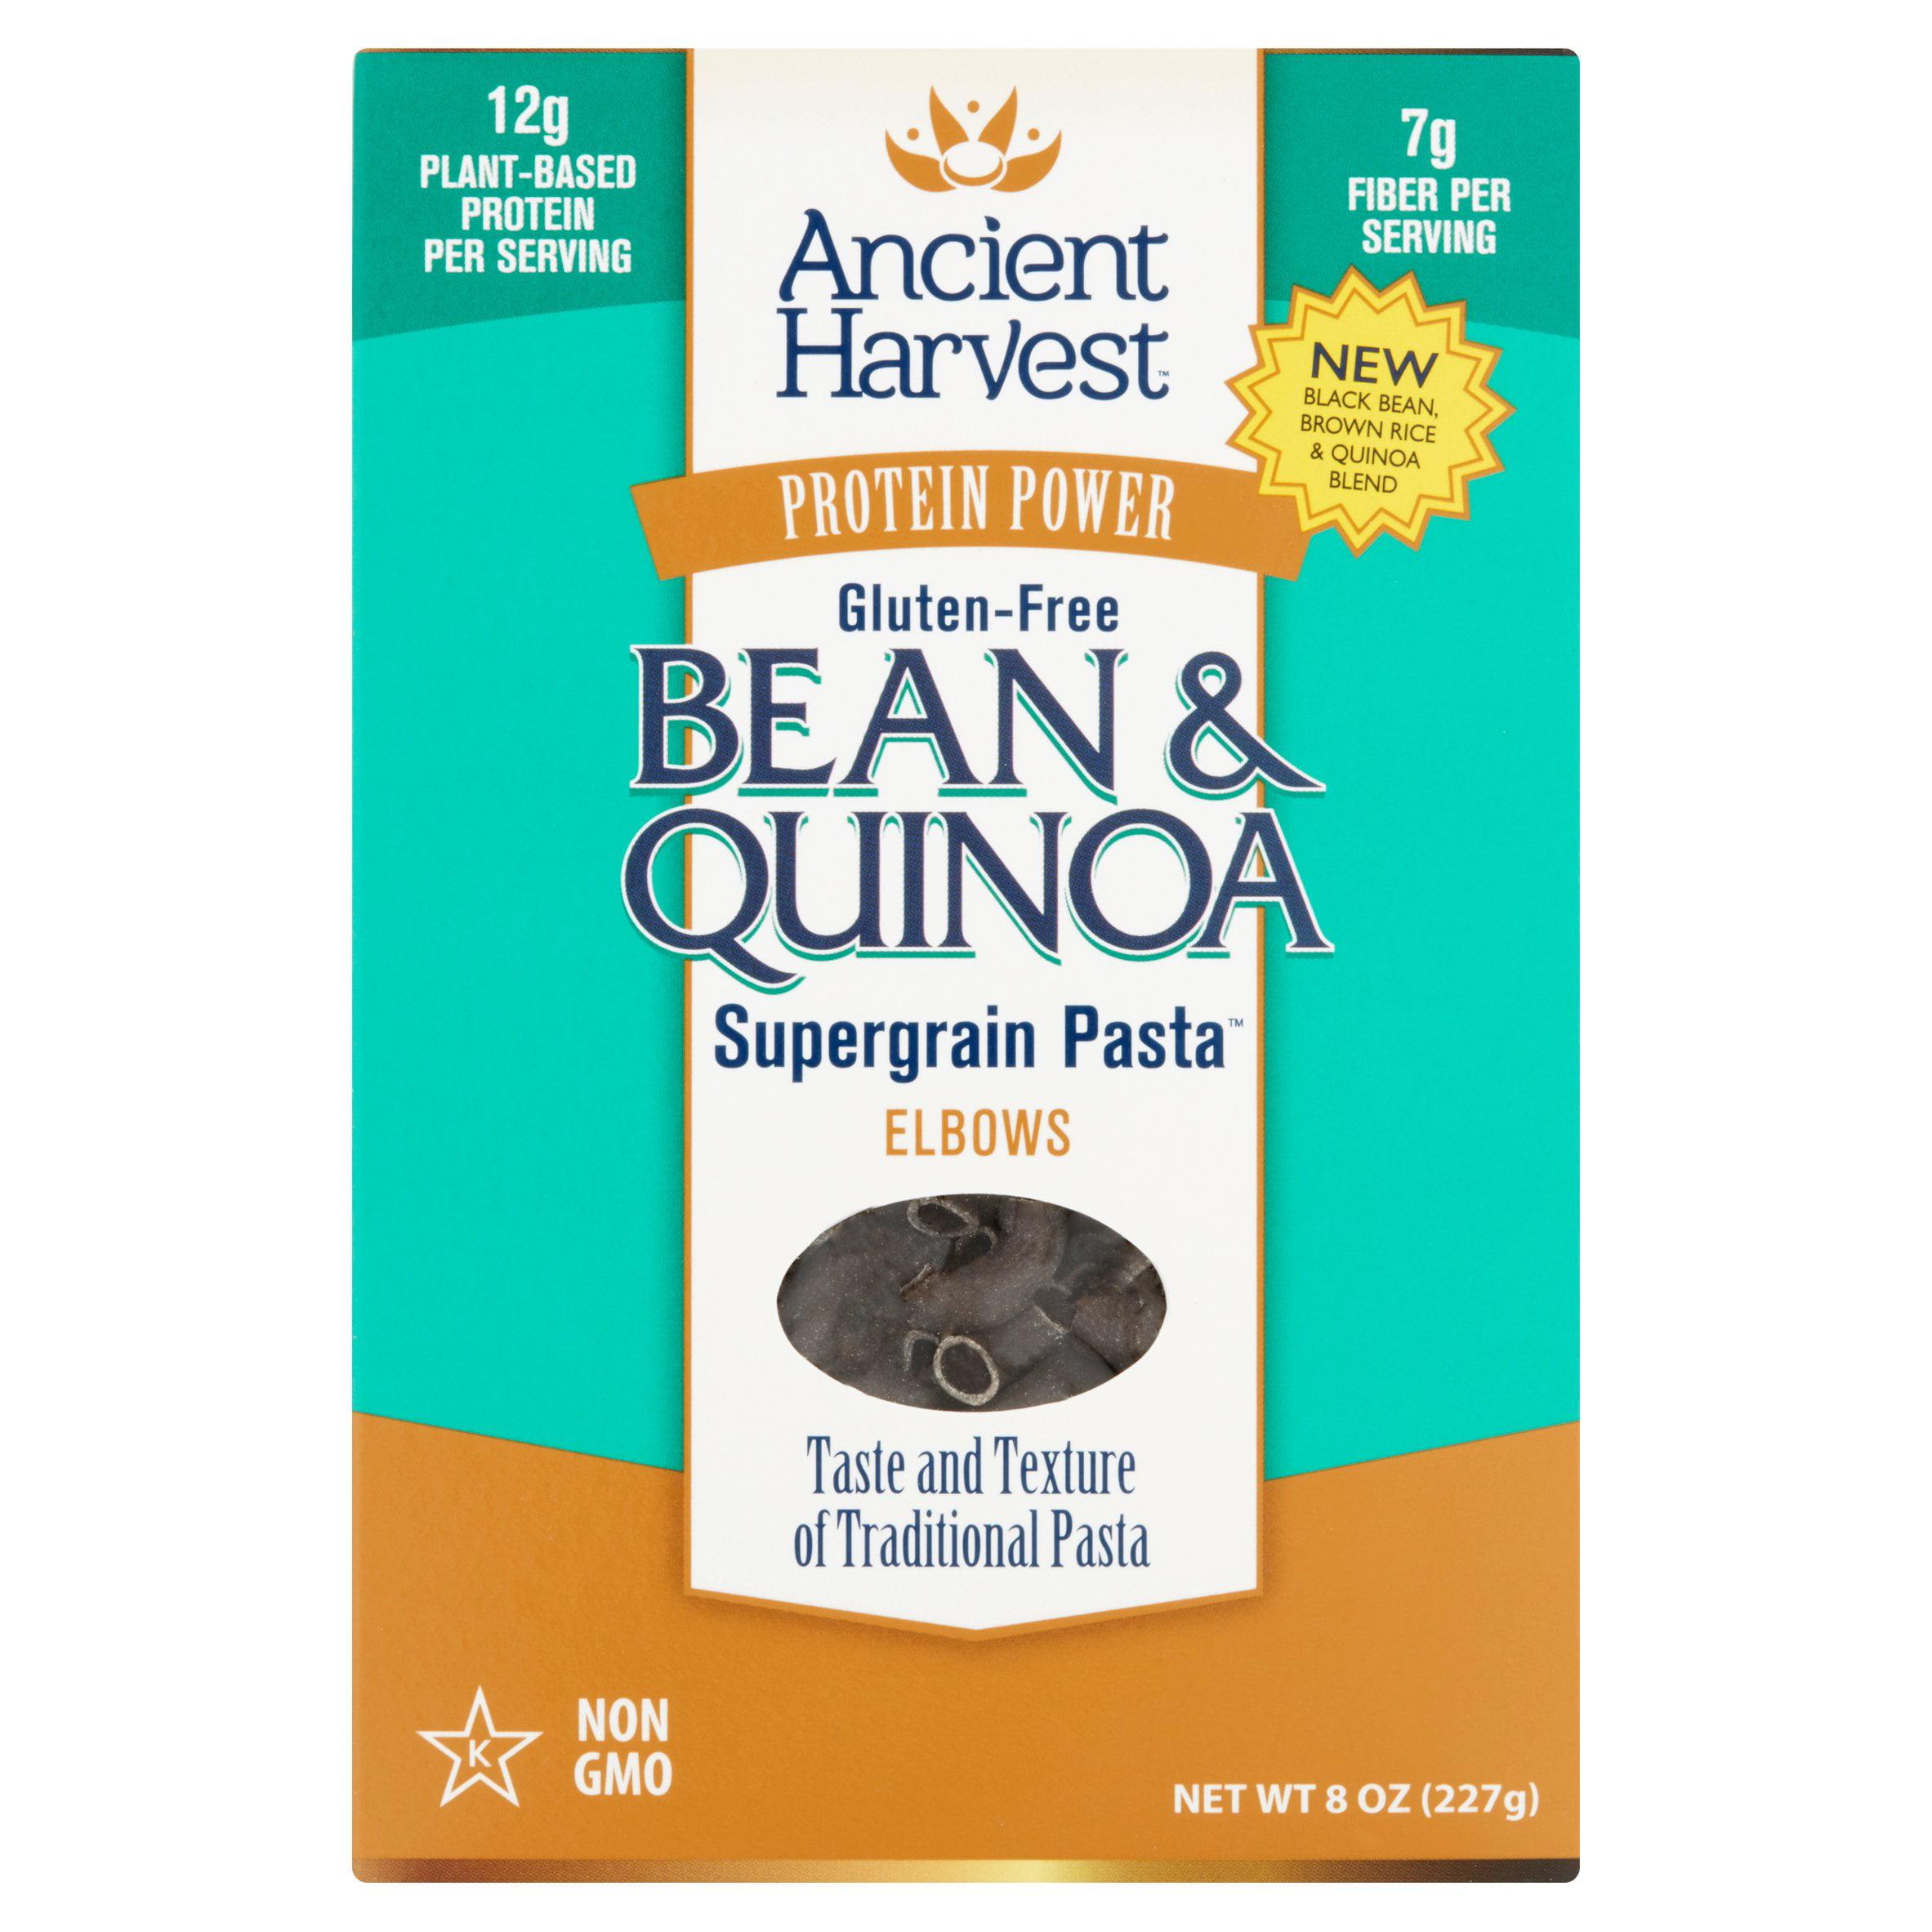 Ancient Harvest Supergrain Pasta Elbows Bean & Quinoa, 8 oz, 6 pack by Quinoa Corporation